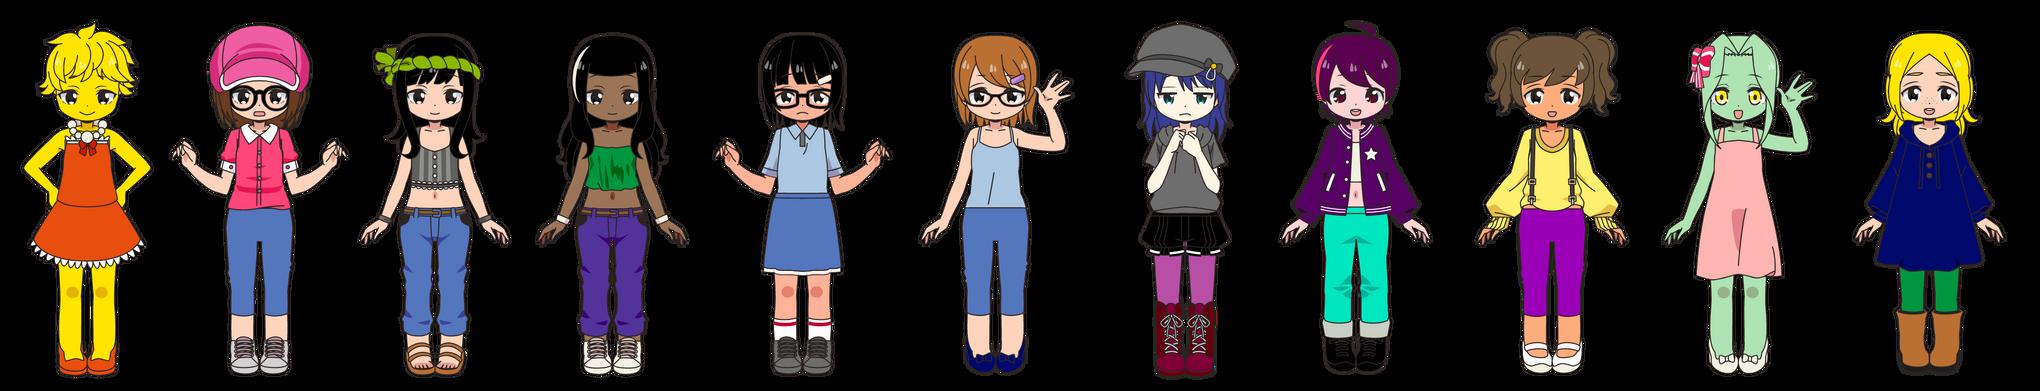 Girls of Animation Domination 2021